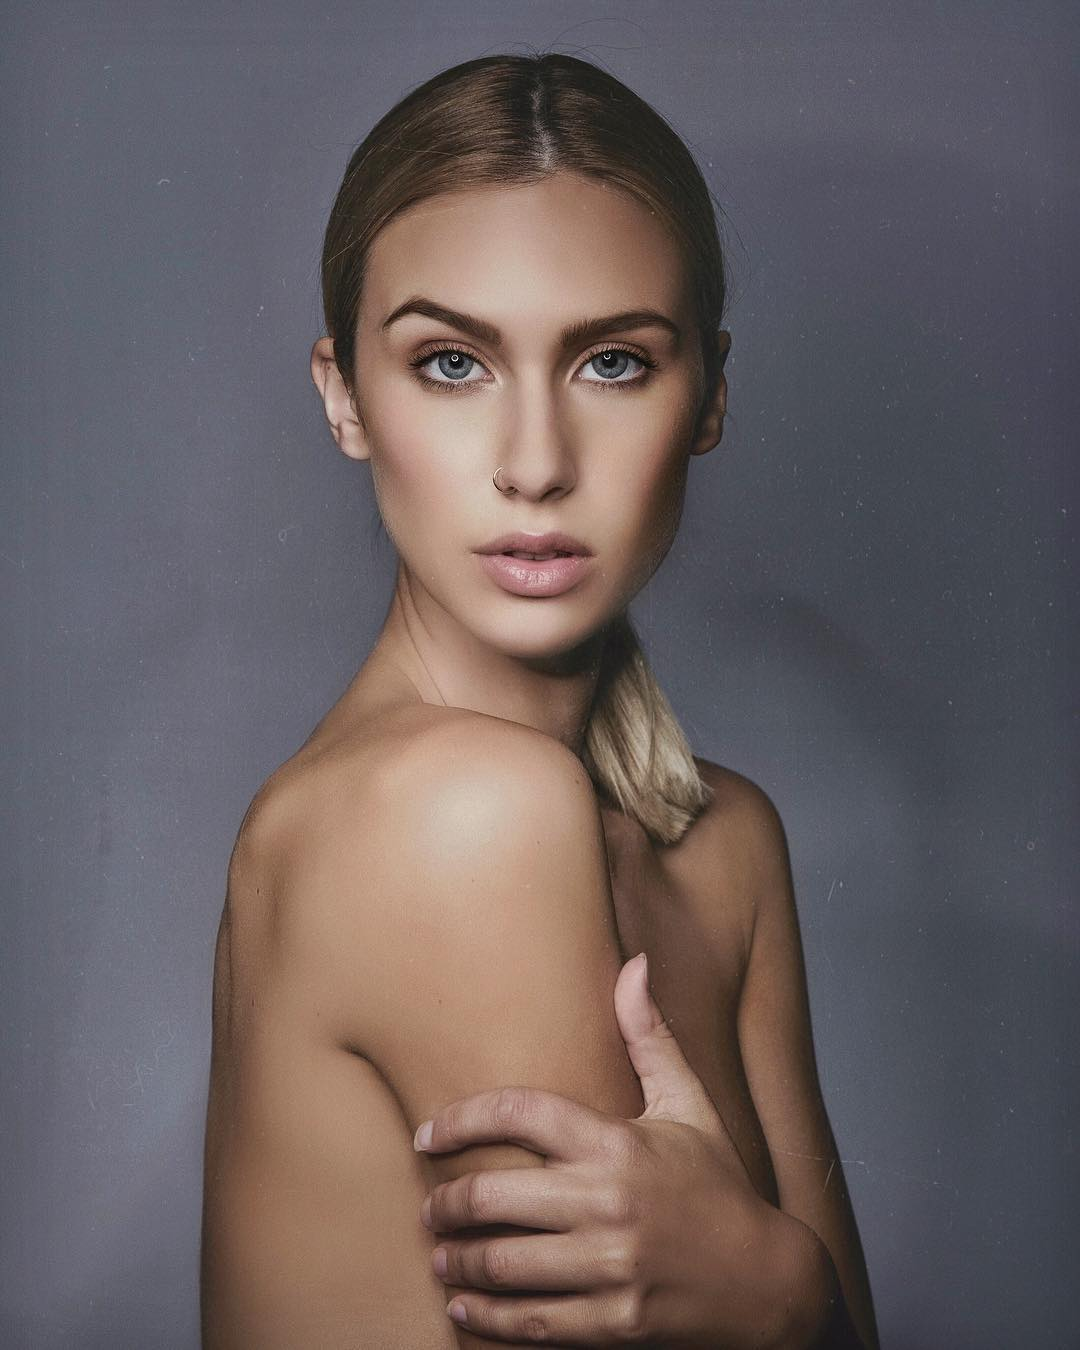 Maggie Keating Americas Next Top Model Fandom Powered By Wikia